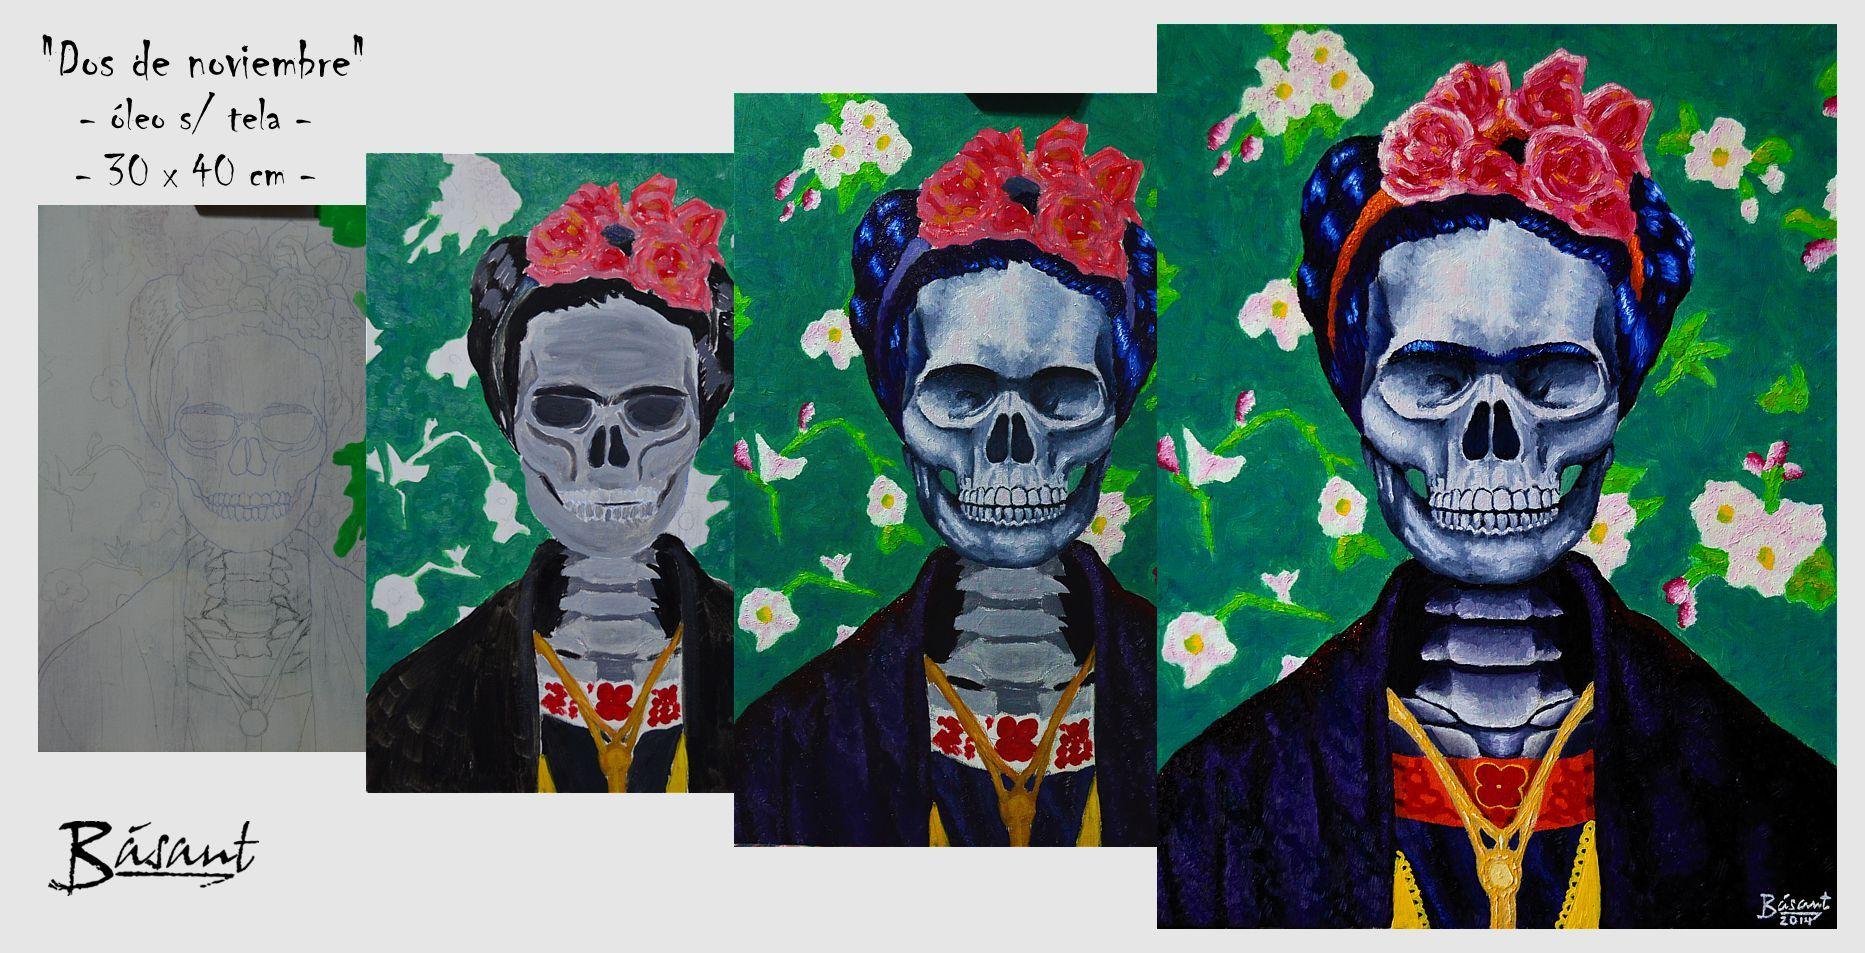 #Frida #Kahlo #painting #pintura #oil #óleo  #Básant Facebook album: https://www.facebook.com/media/set/?set=a.1580575845498621.1073741847.1480678848821655&type=3